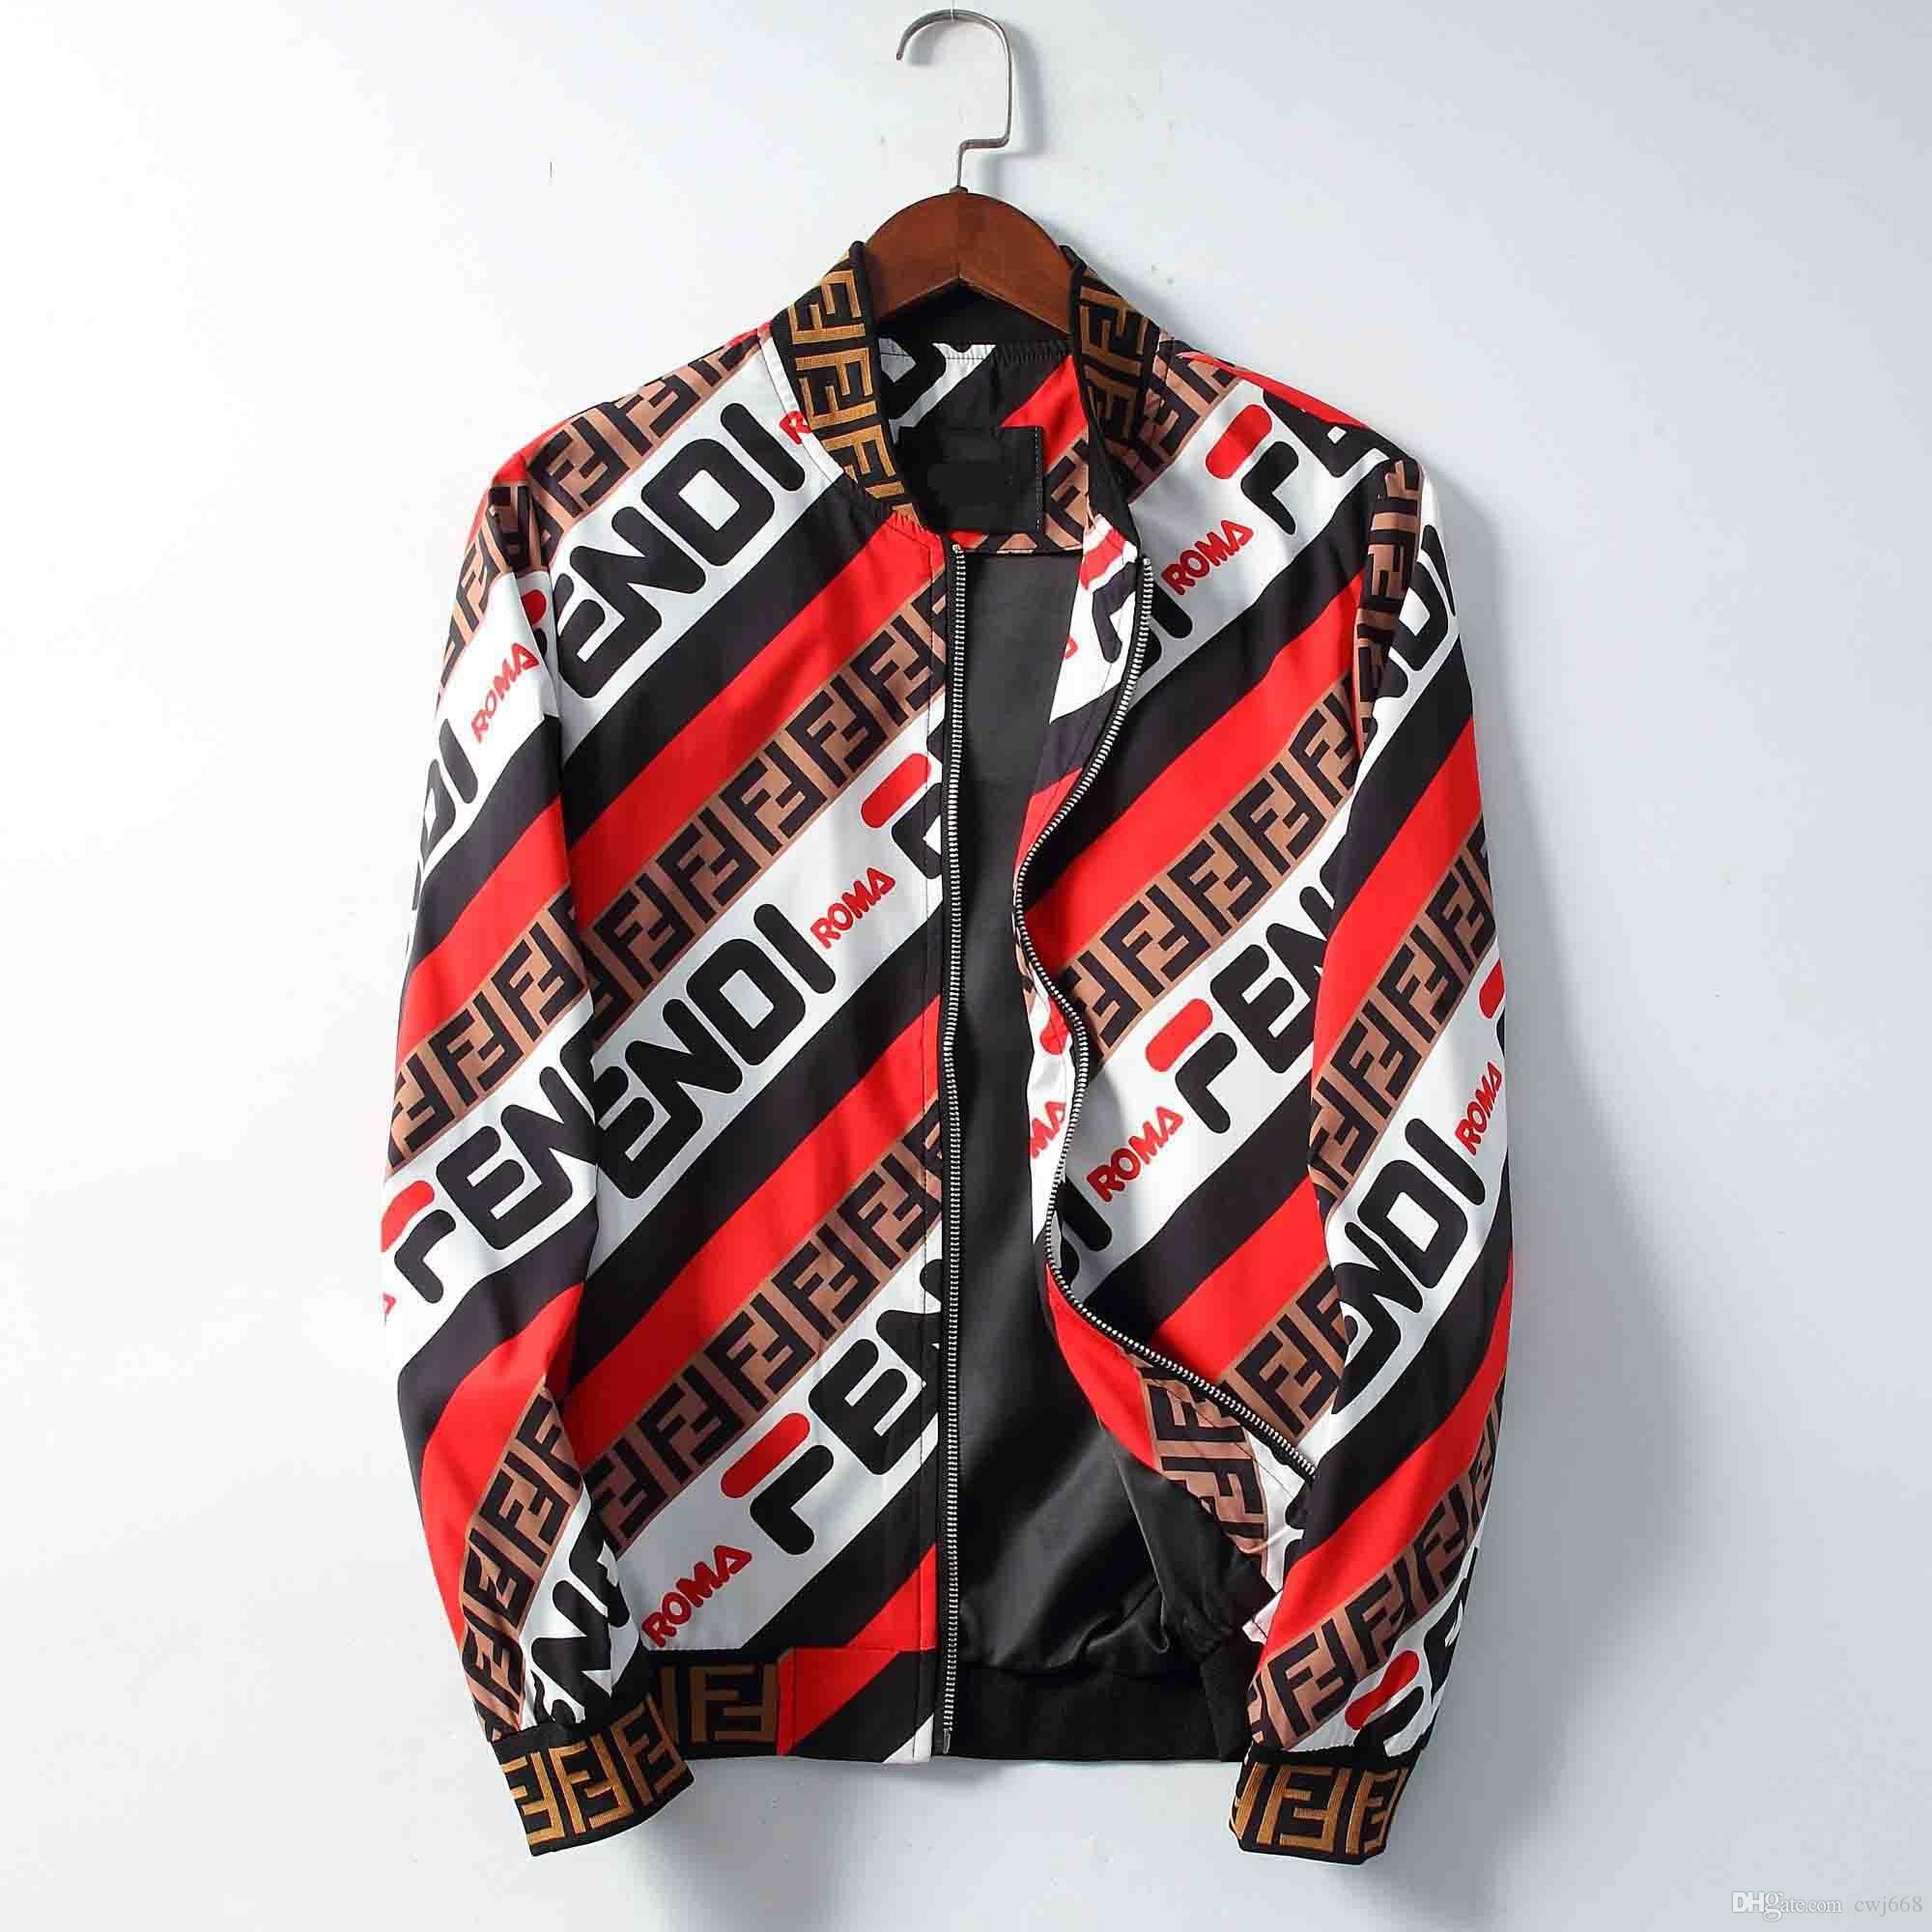 masculina de luxo Design Inverno Jacket piloto jaqueta corta-vento Oversized jaqueta casual Tops Femininos Grande Tamanho S-3XL